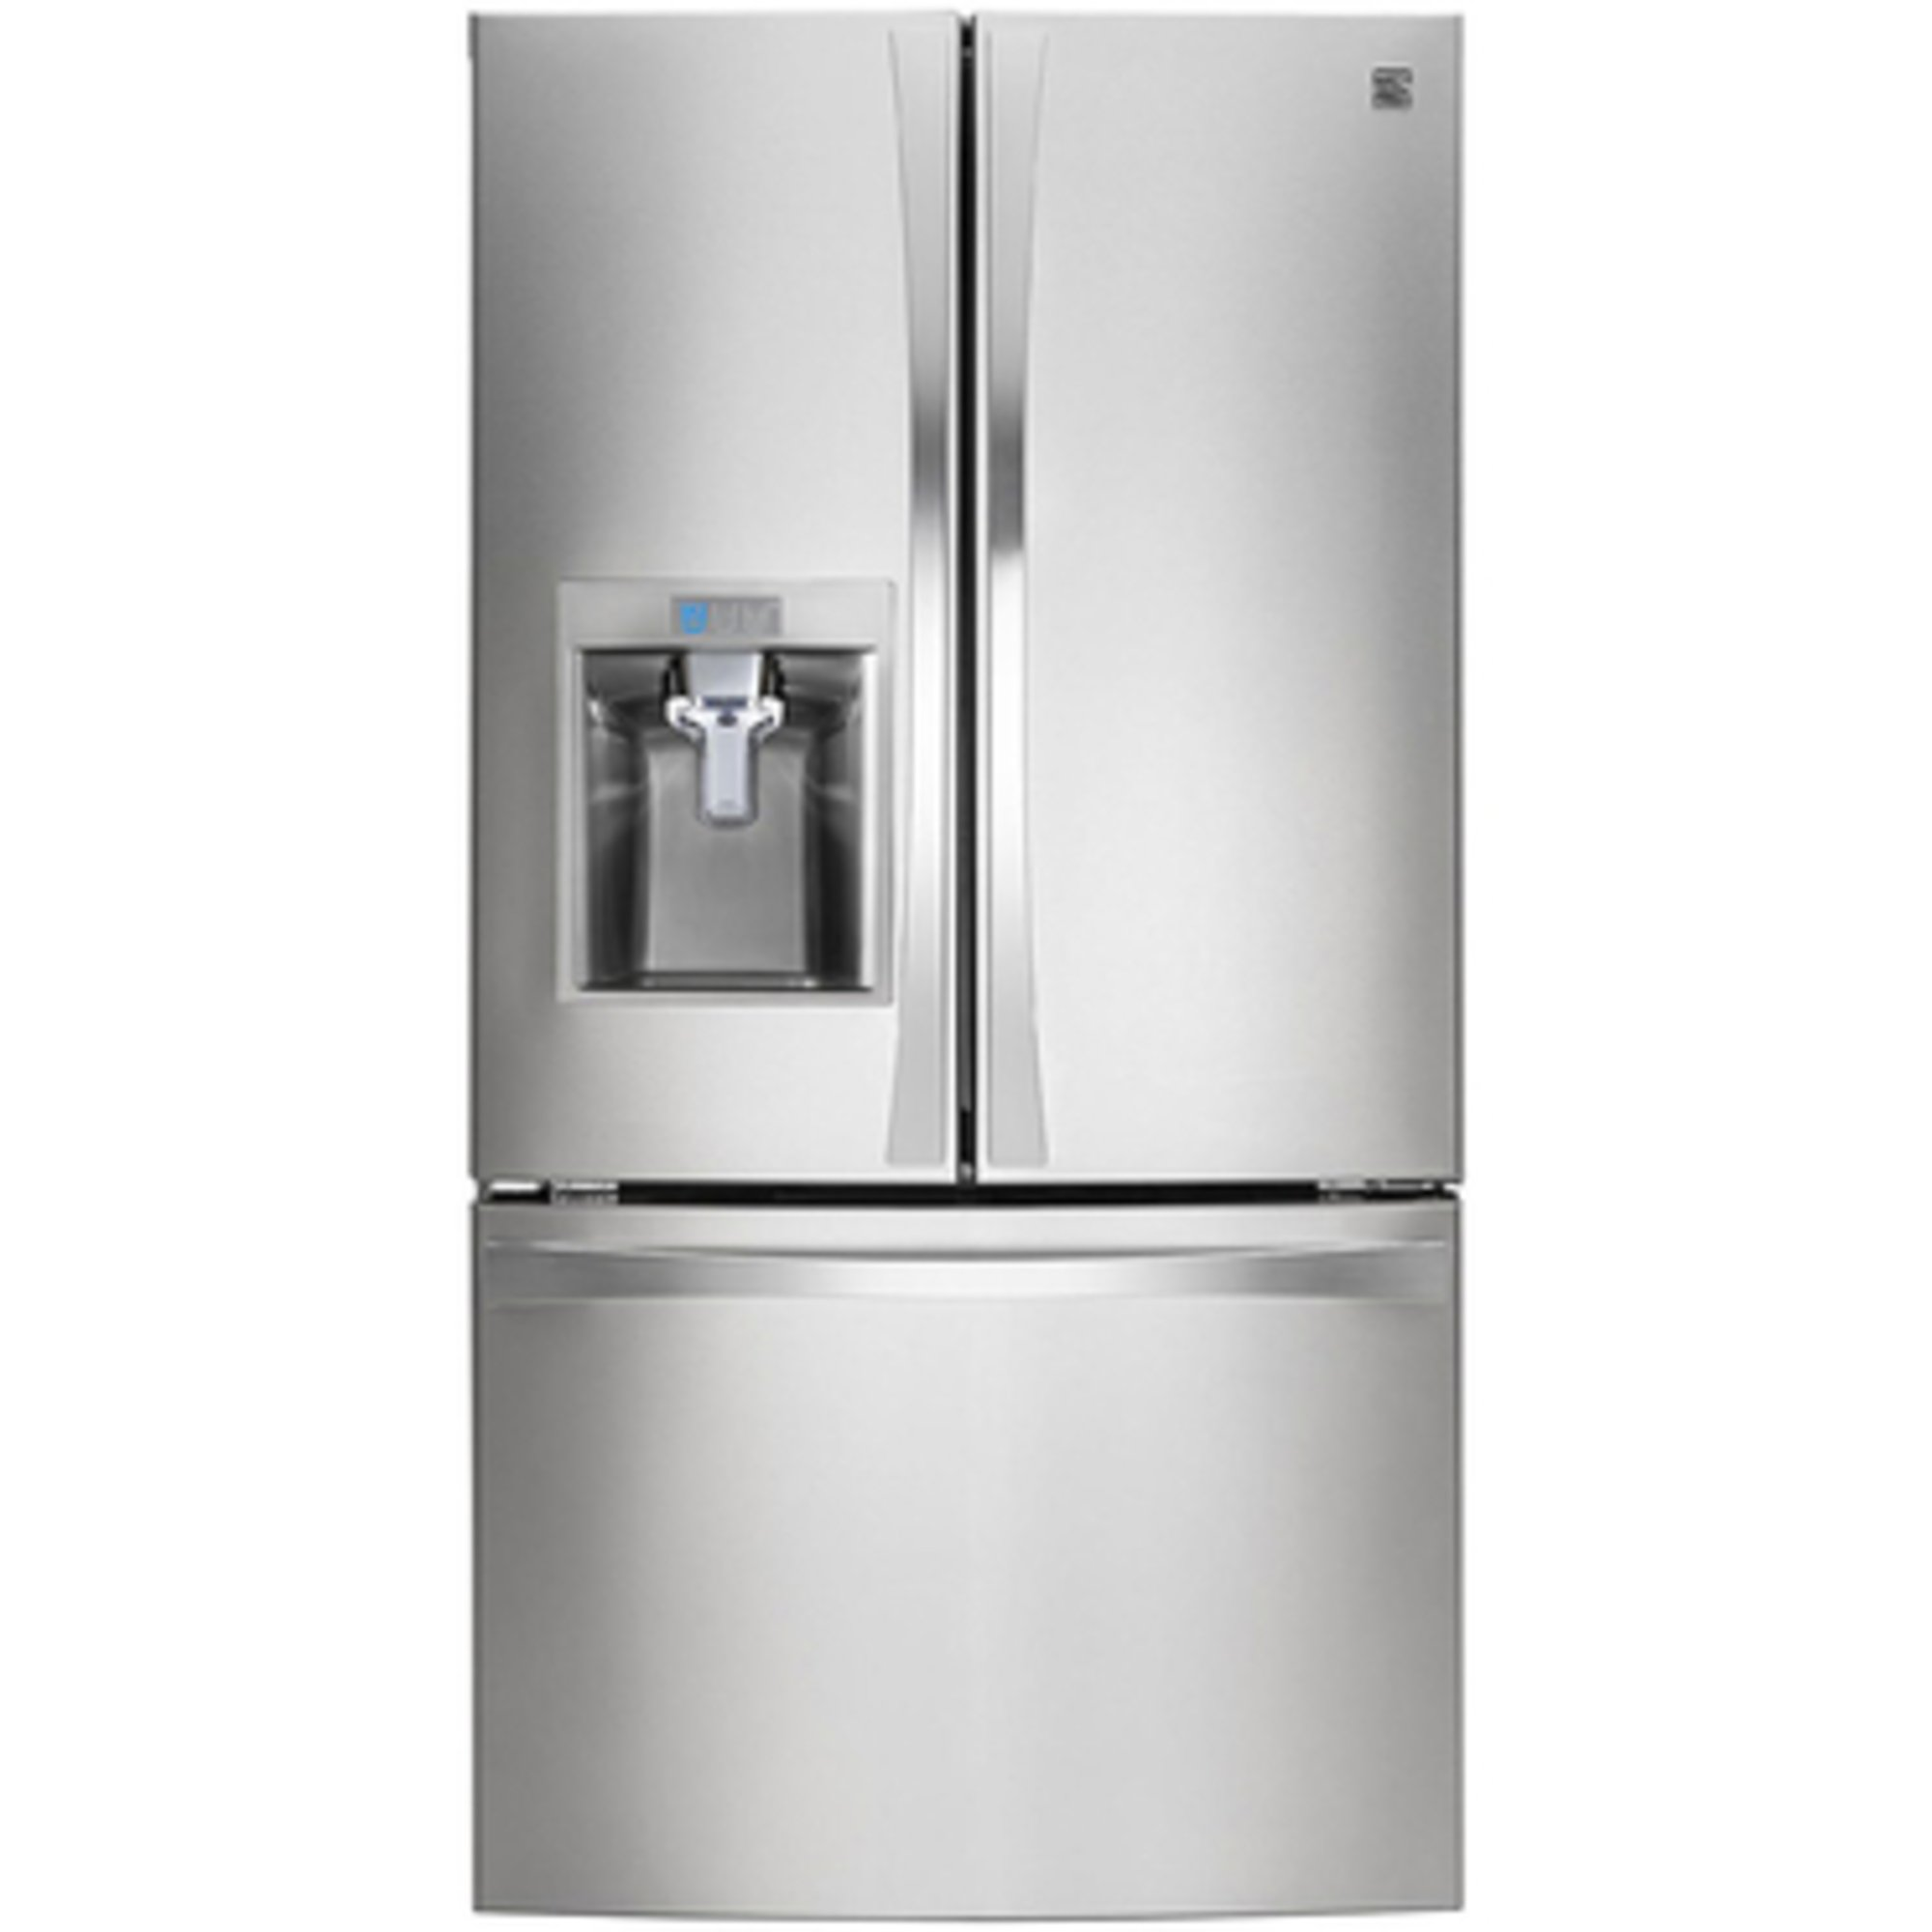 fridge hook up kit im 18 dating a 37 year old